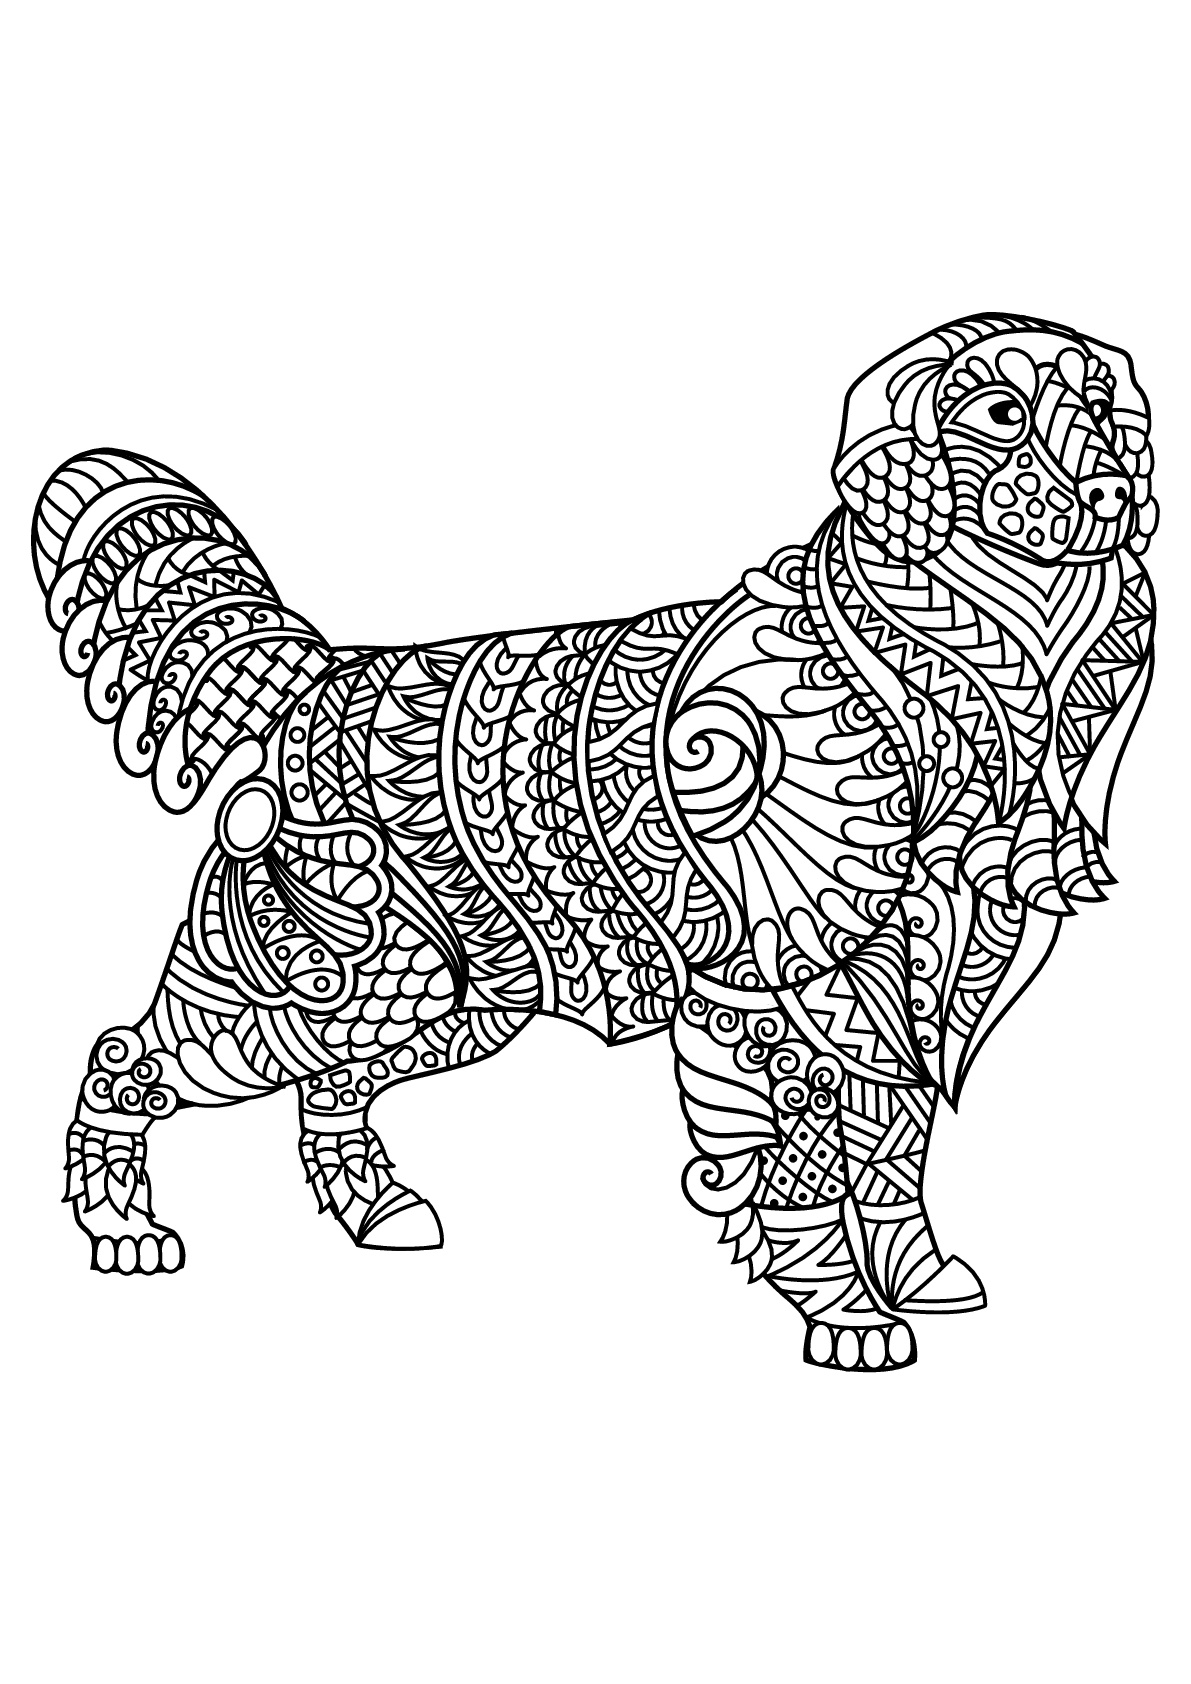 Livre gratuit chien labrador chiens coloriages - Coloriage labrador ...